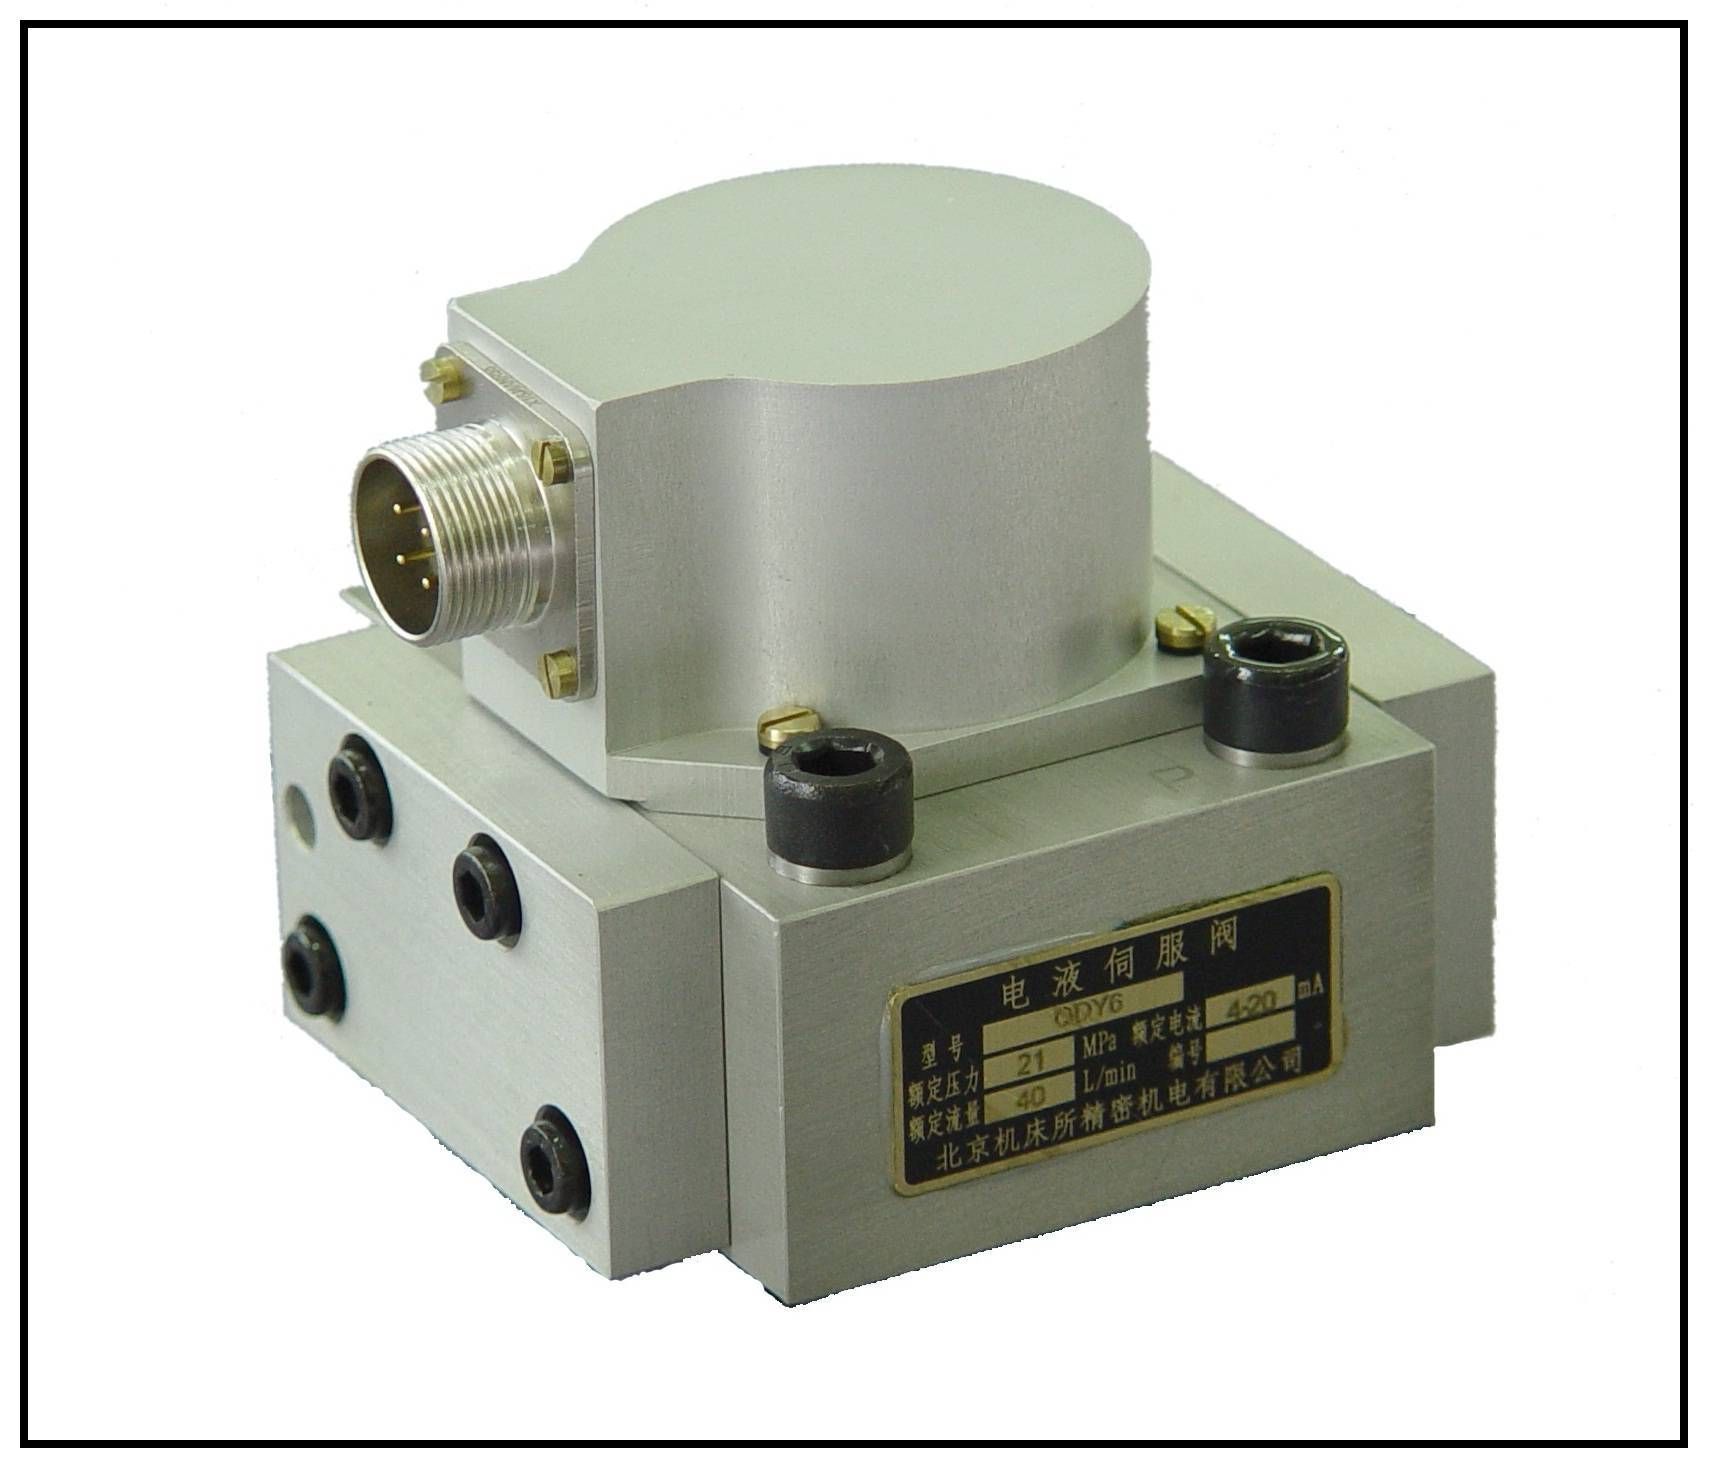 Hydraulic Servo Valve : Electro hydraulic servo valve qdy b bmti